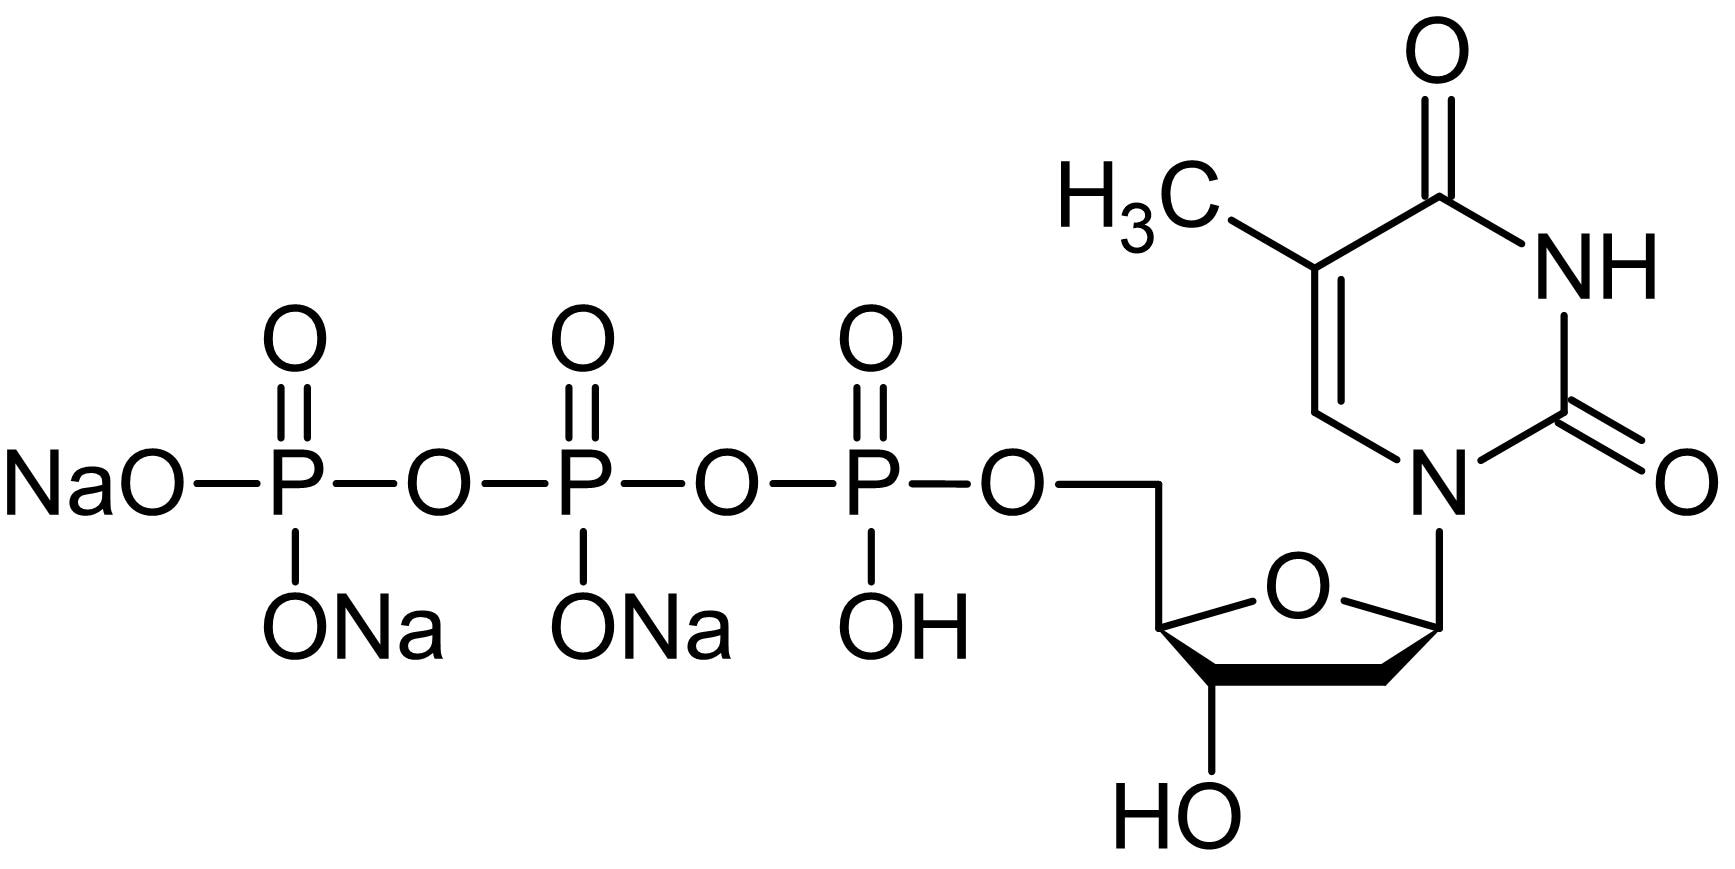 Chemical Structure - 2'-Deoxythymidine 5'-triphosphate [dTTP] trisodium salt, nucleoside triphosphate (ab146540)